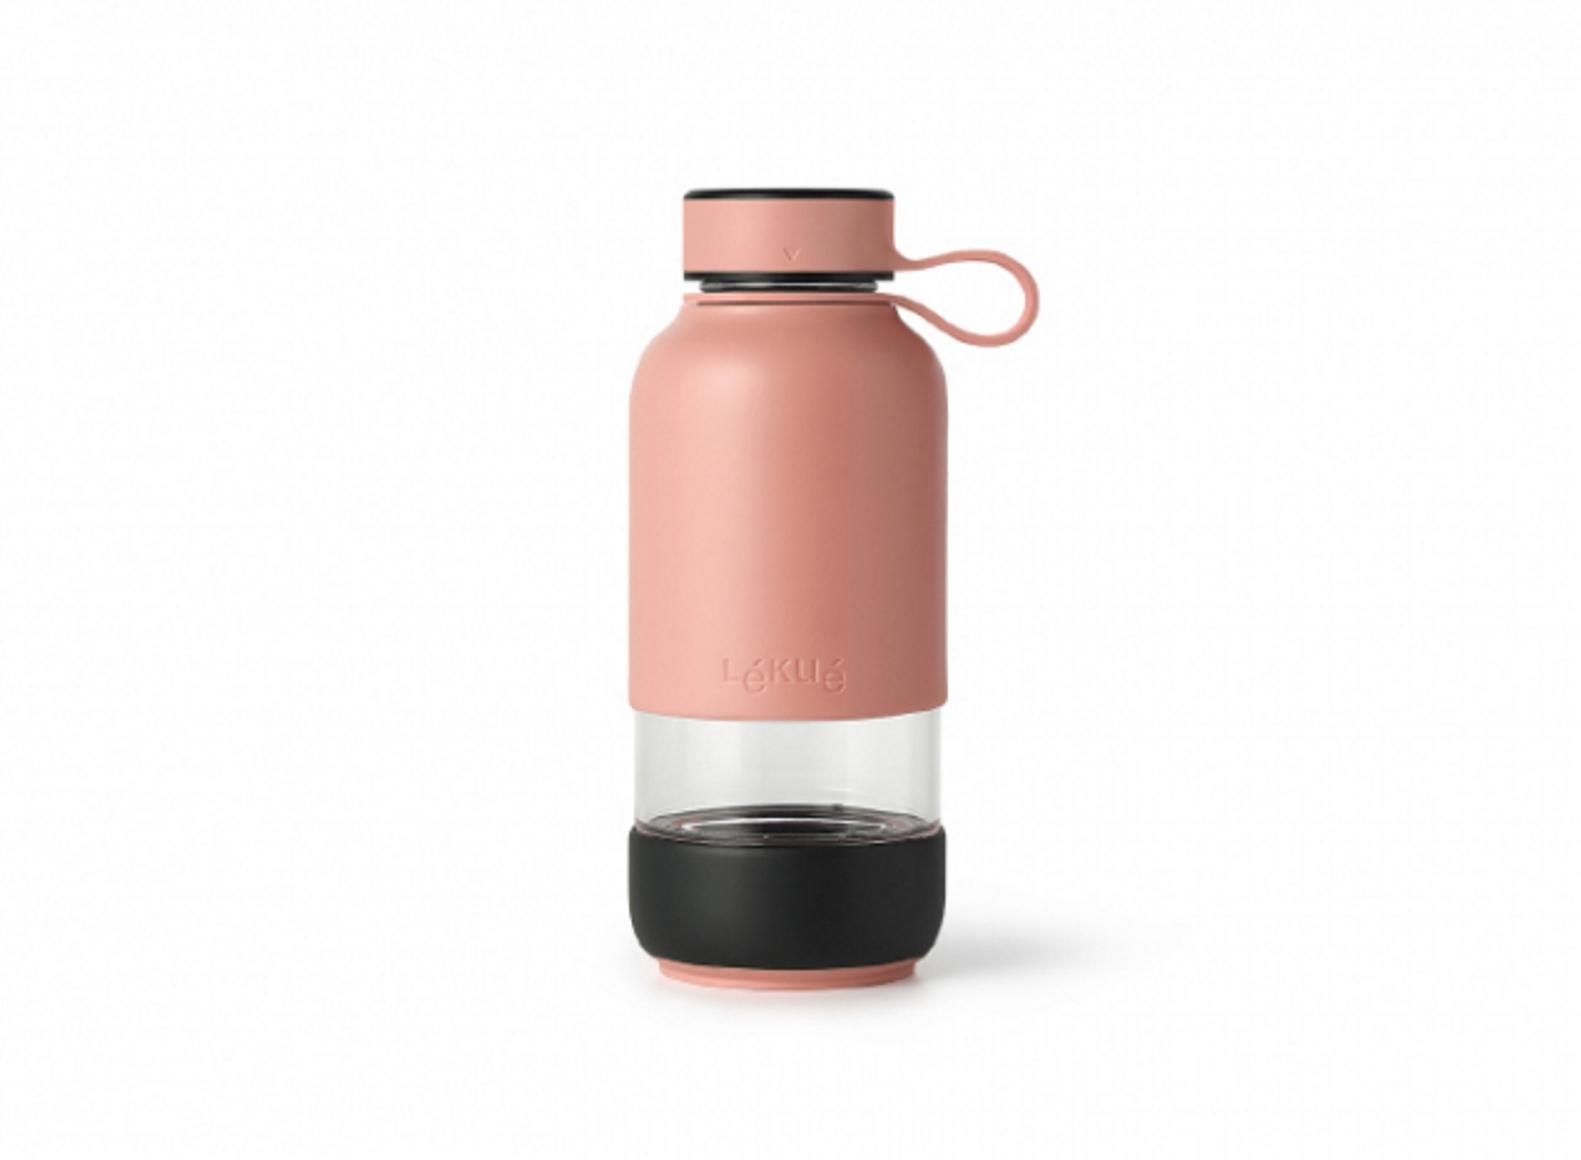 Онлайн каталог PROMENU: Бутылка для воды Lekue TO GO, объем 0,6 л, розовый Lekue 0302018R06M017